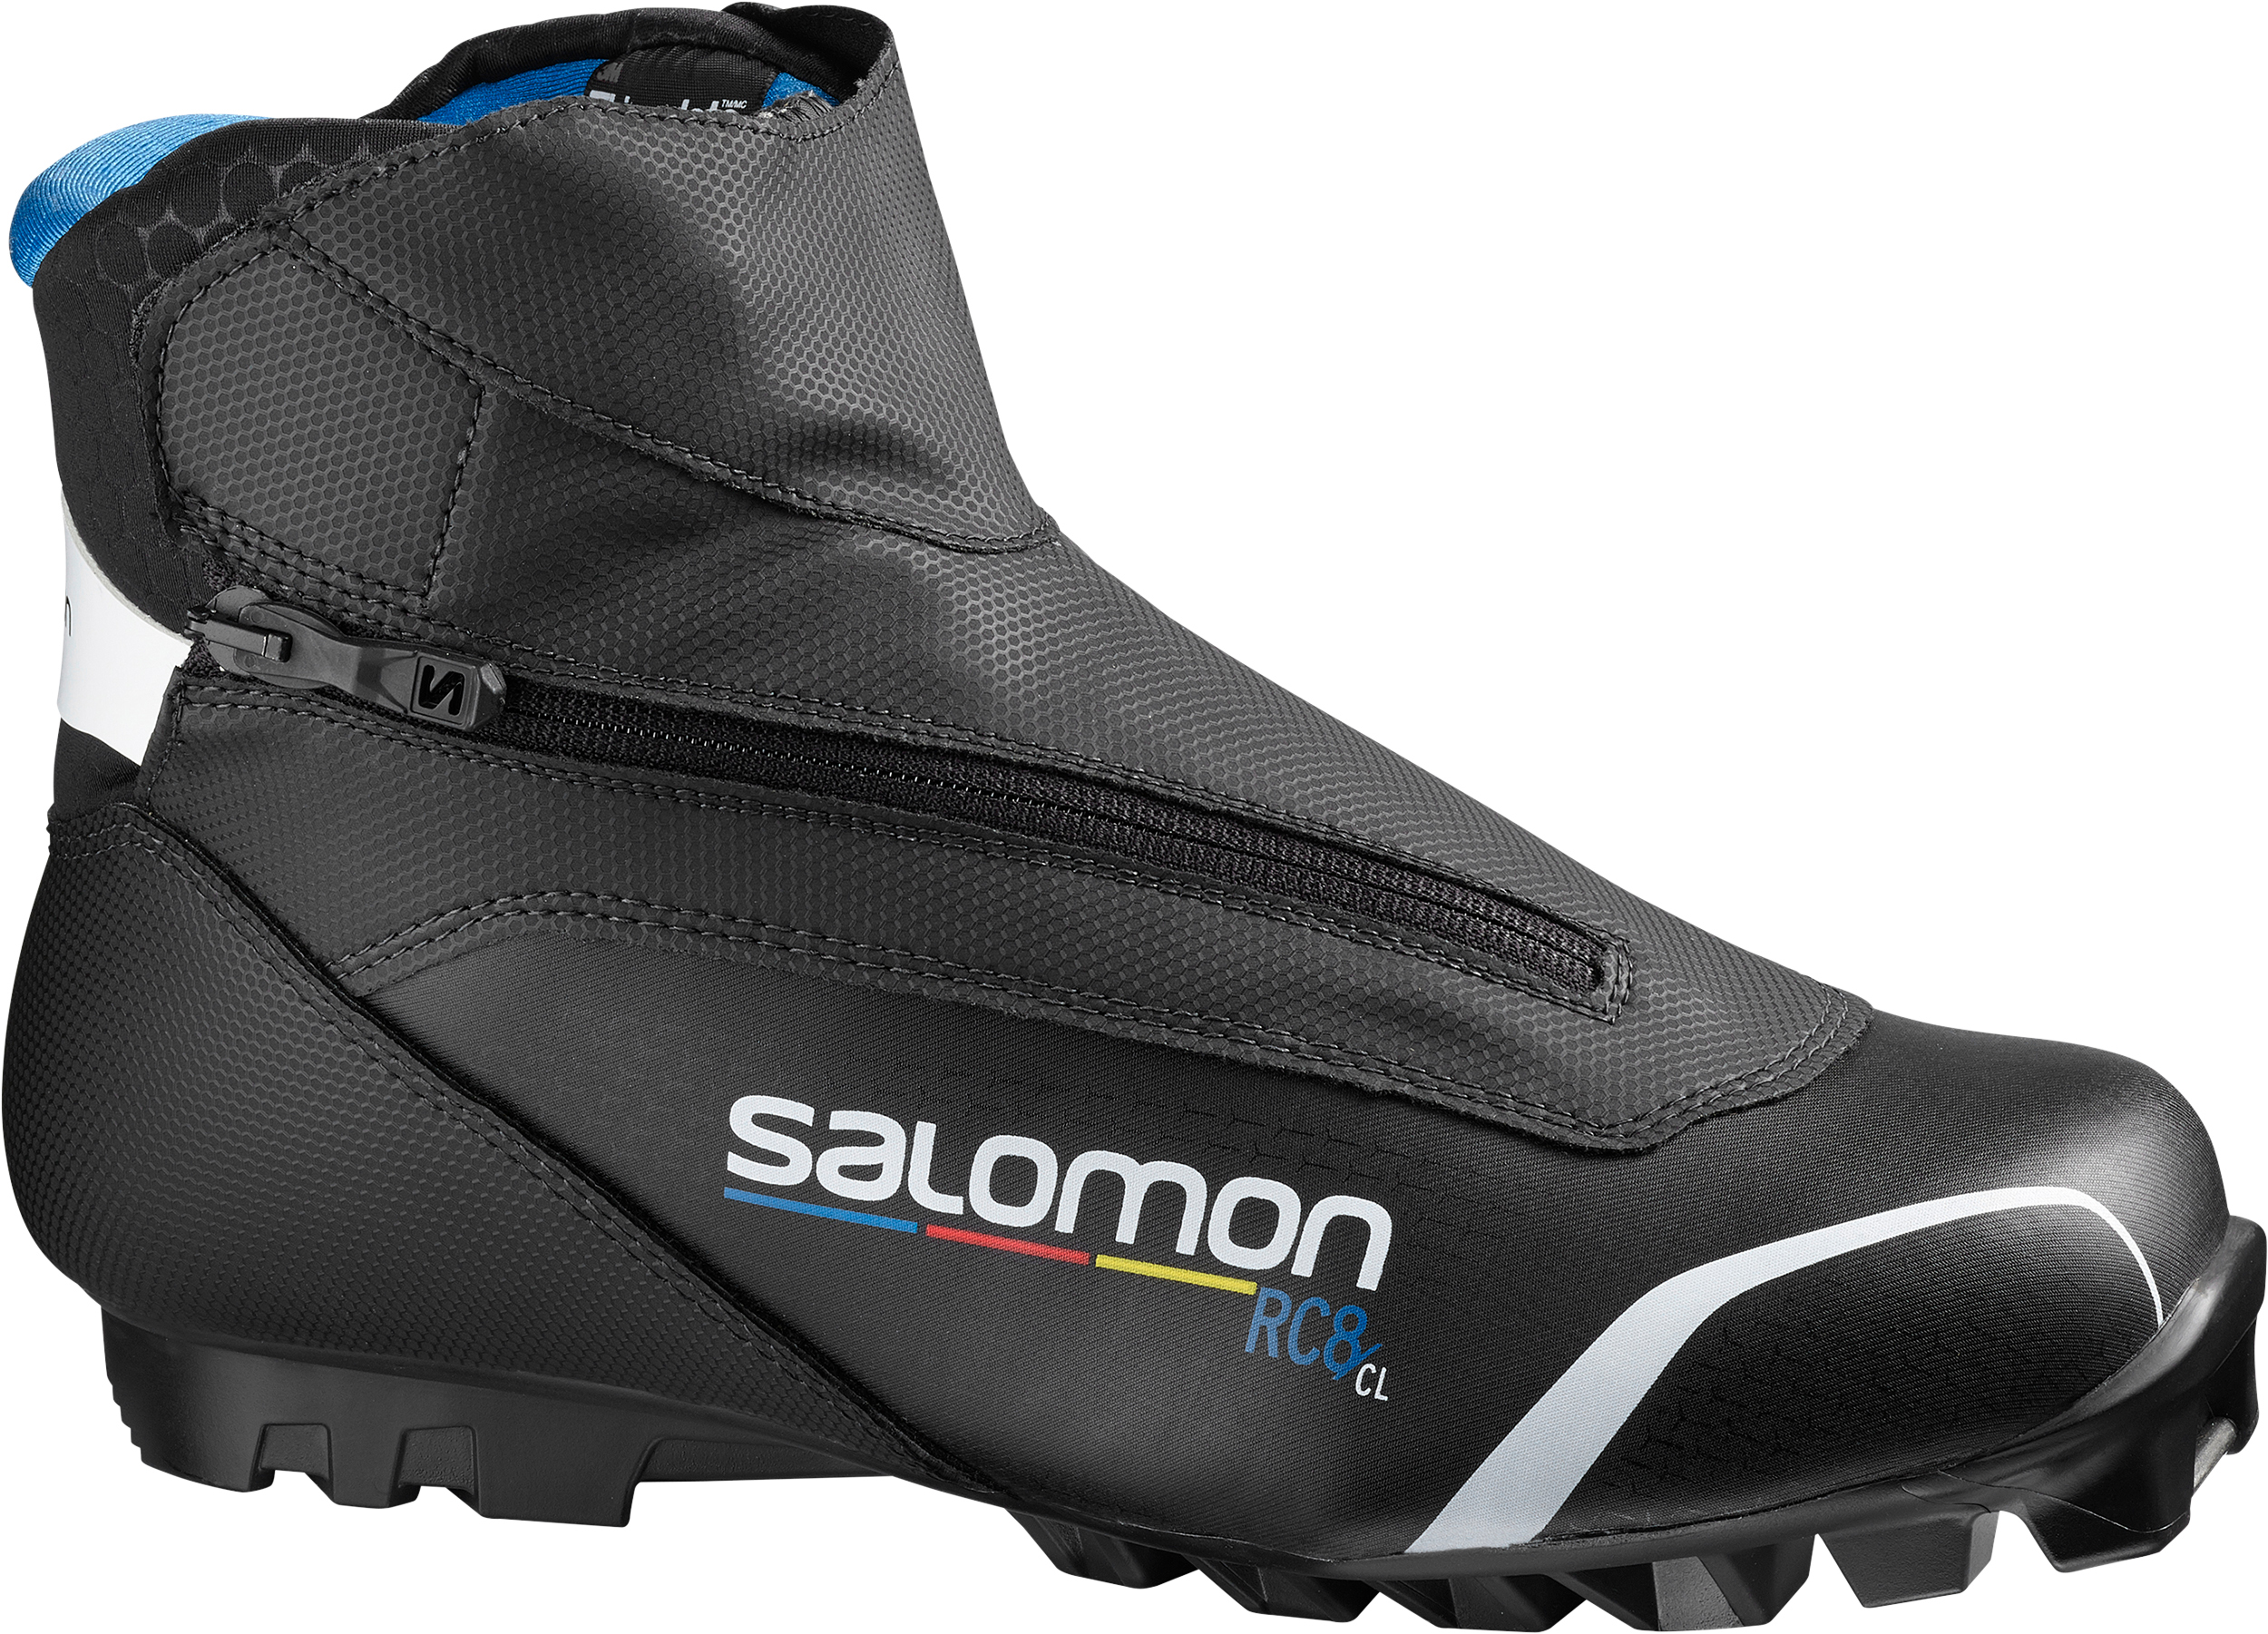 Salomon RC Carbon SNS Classic Boot 1718